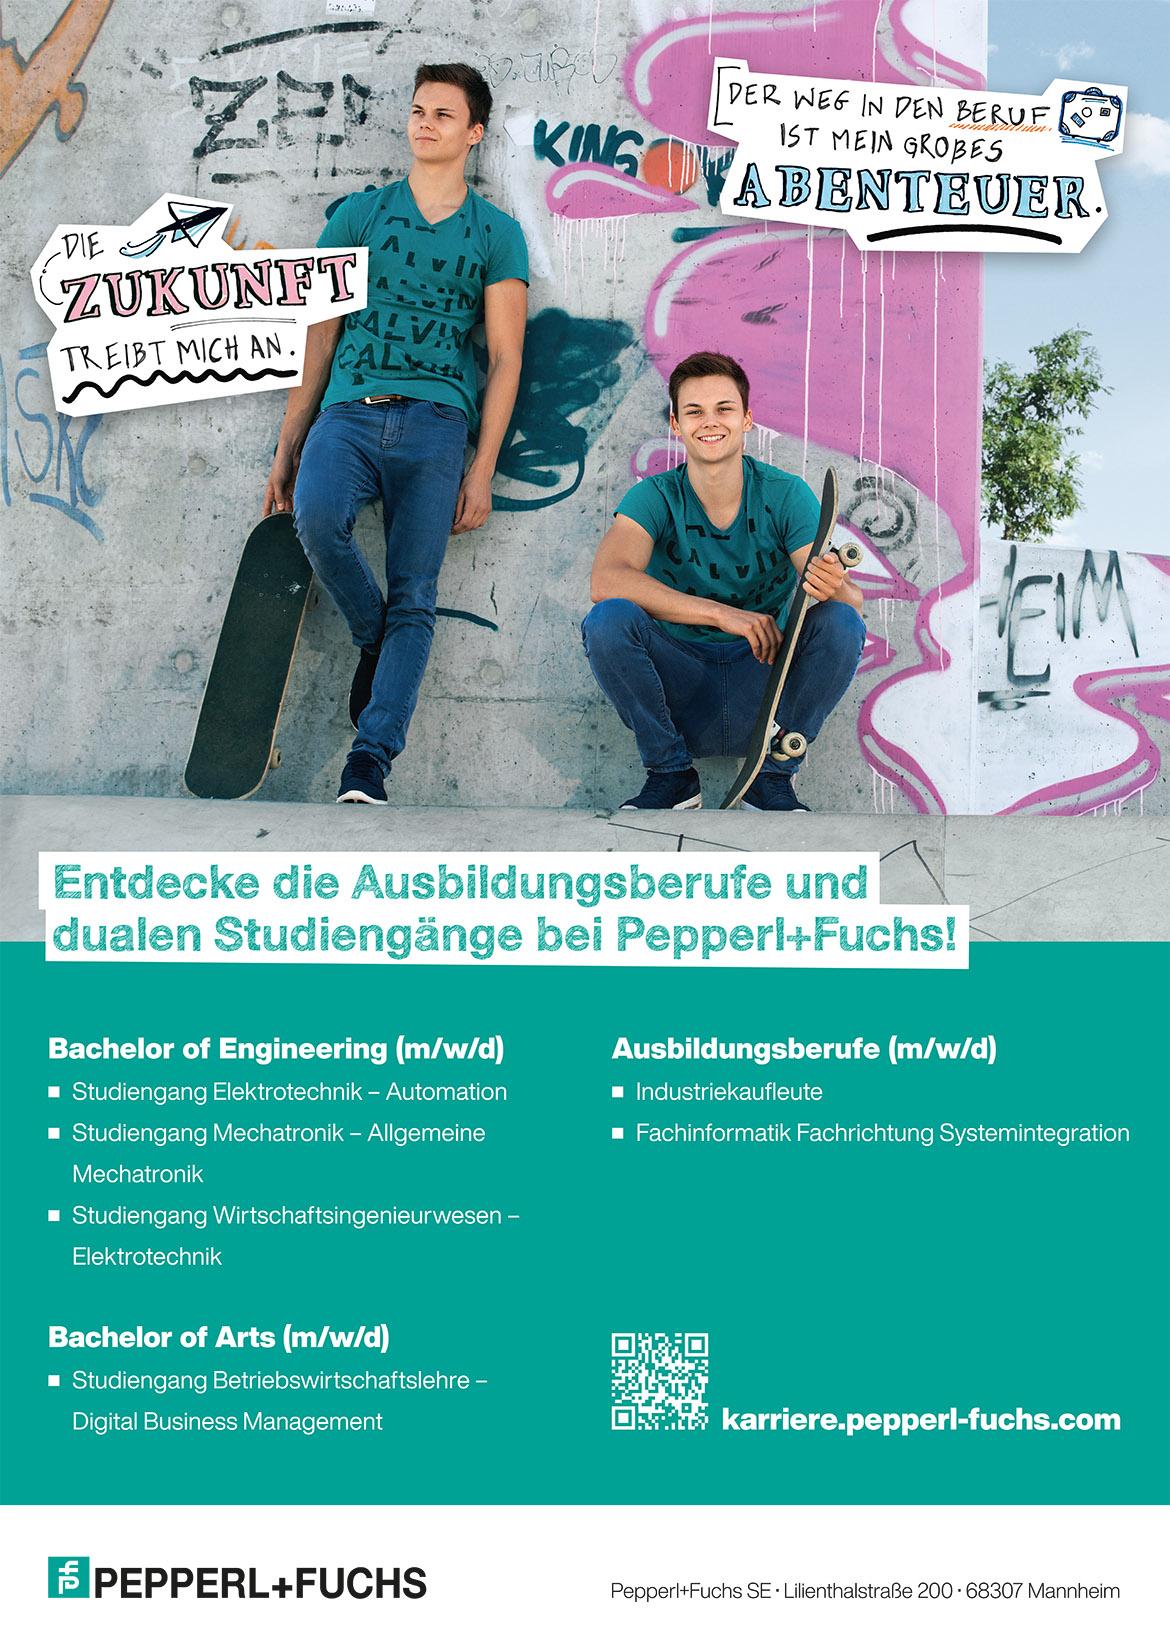 Ausbildungsplakat: Pepperl+Fuchs SE